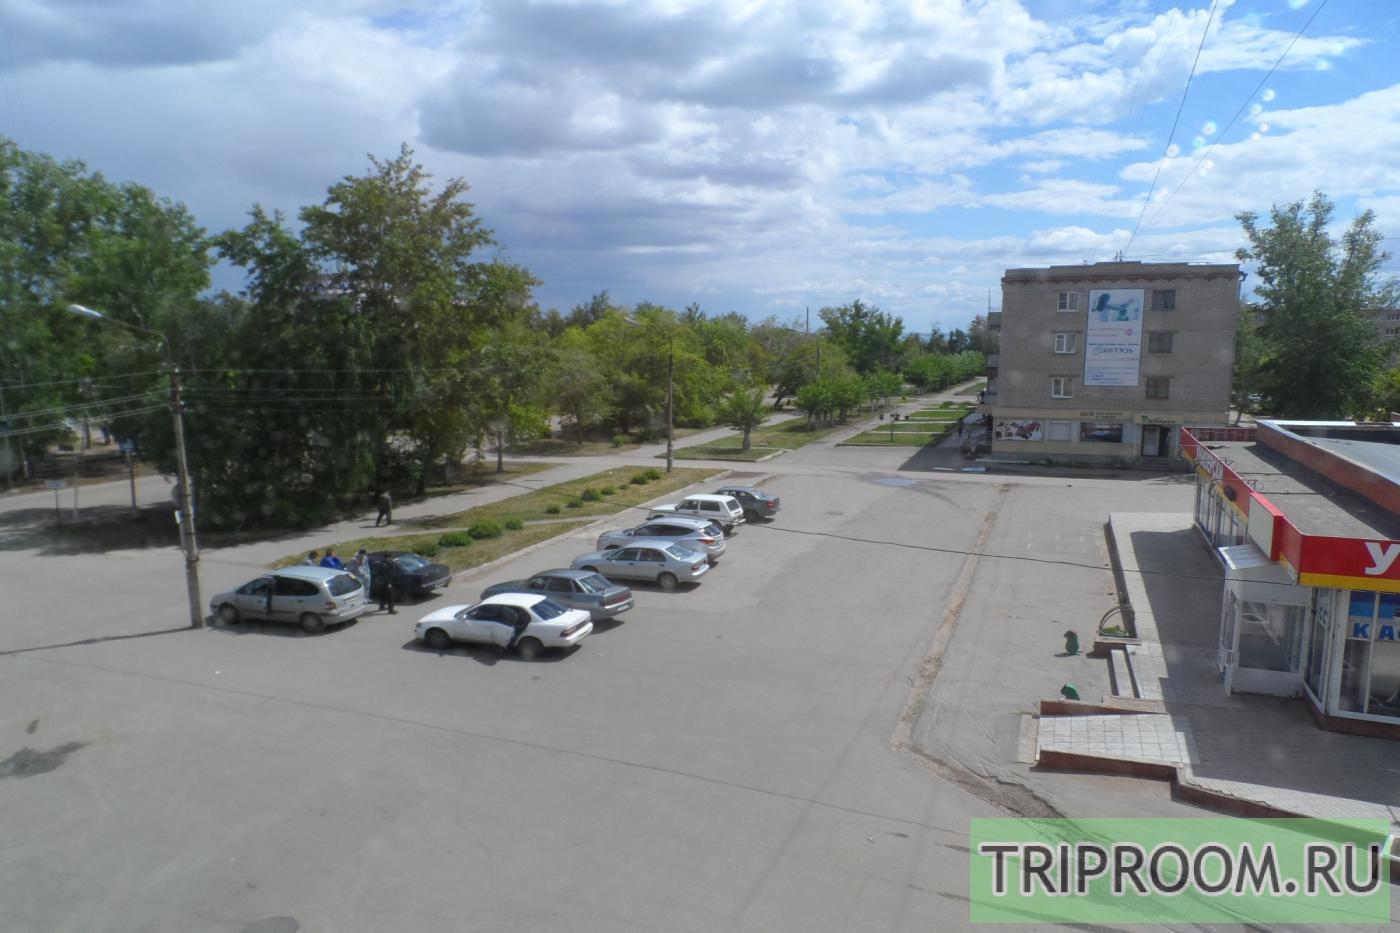 2-комнатная квартира посуточно (вариант № 31690), ул. квартал Б, фото № 15